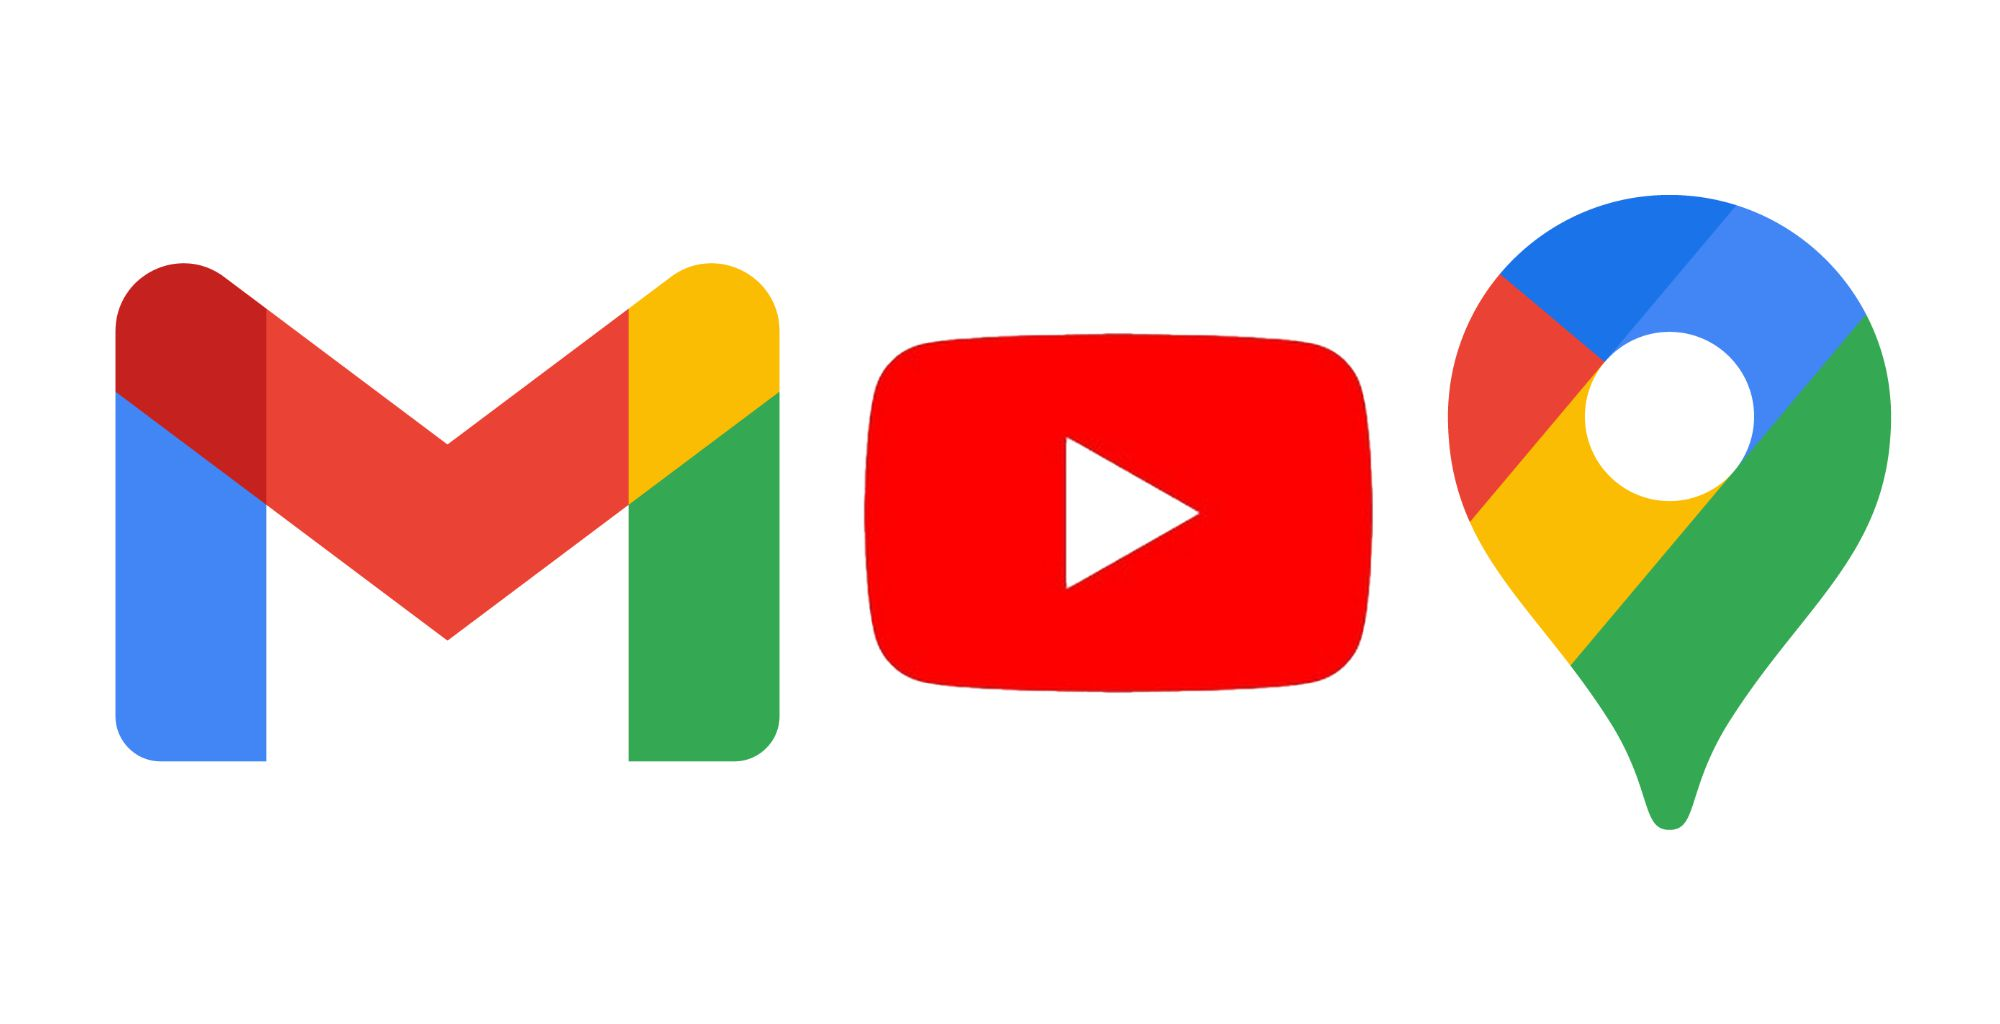 Gmail, YouTube, and Google Maps logo